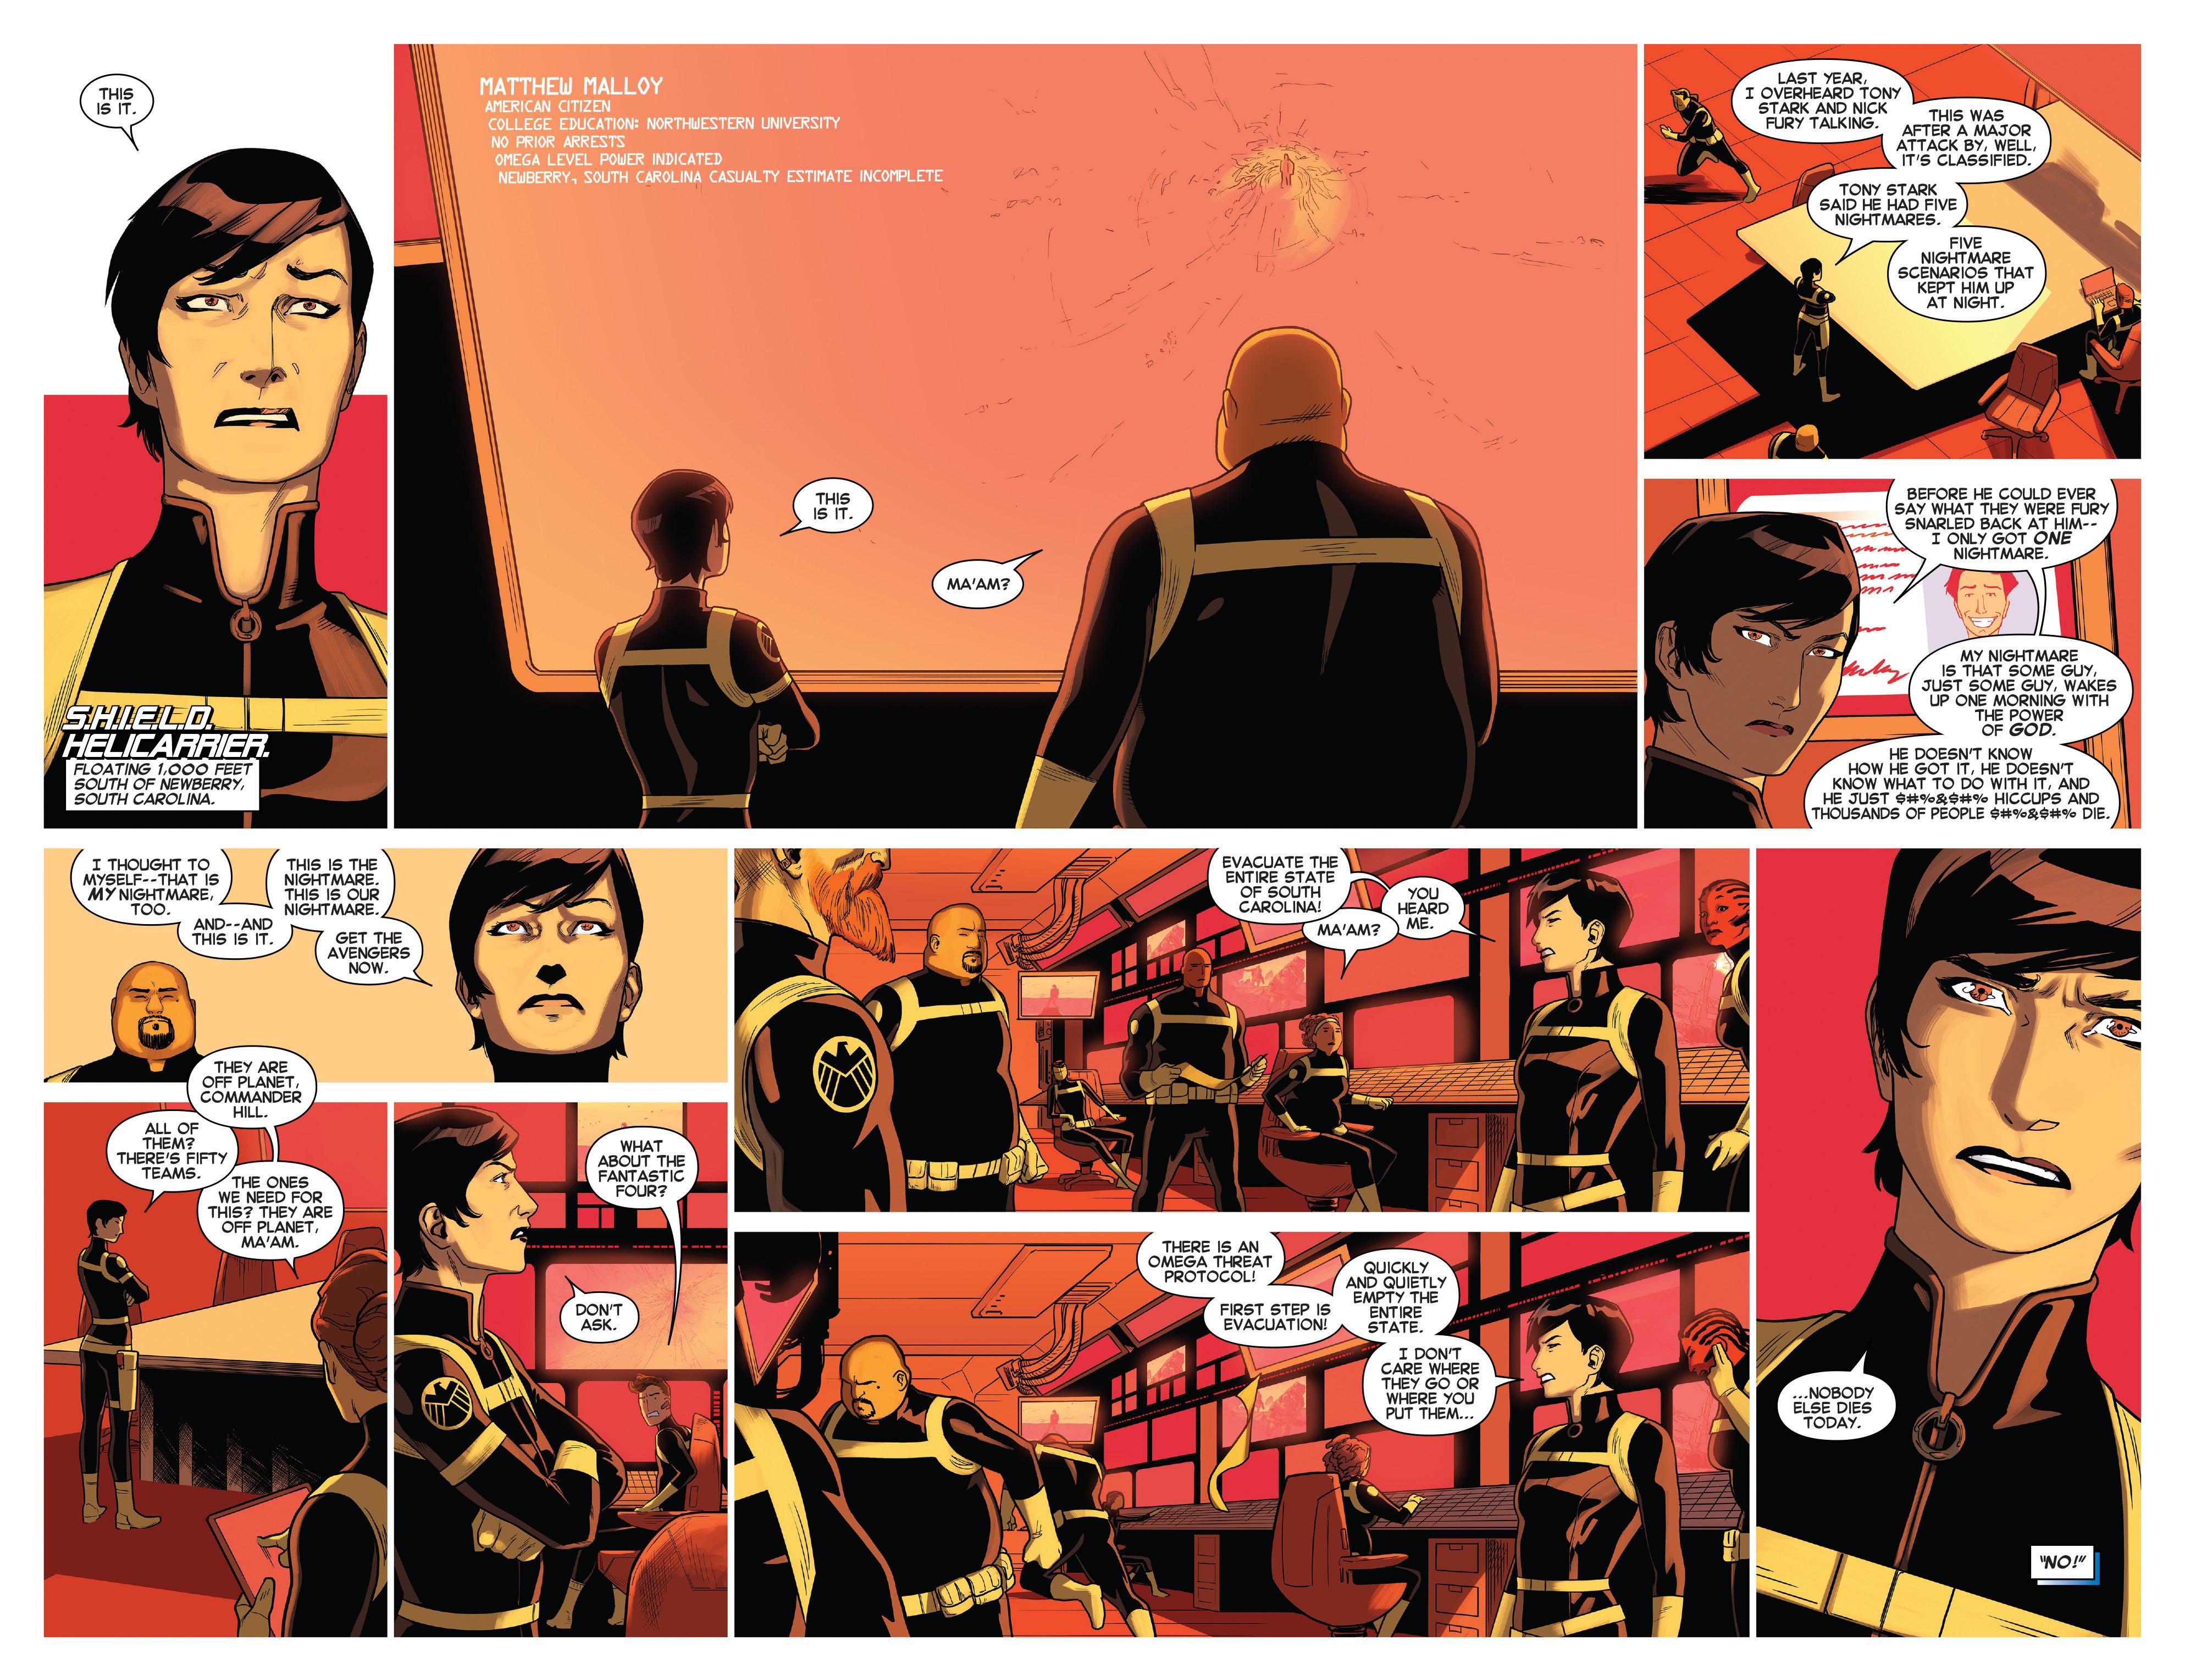 Read online Uncanny X-Men (2013) comic -  Issue # _TPB 5 - The Omega Mutant - 5